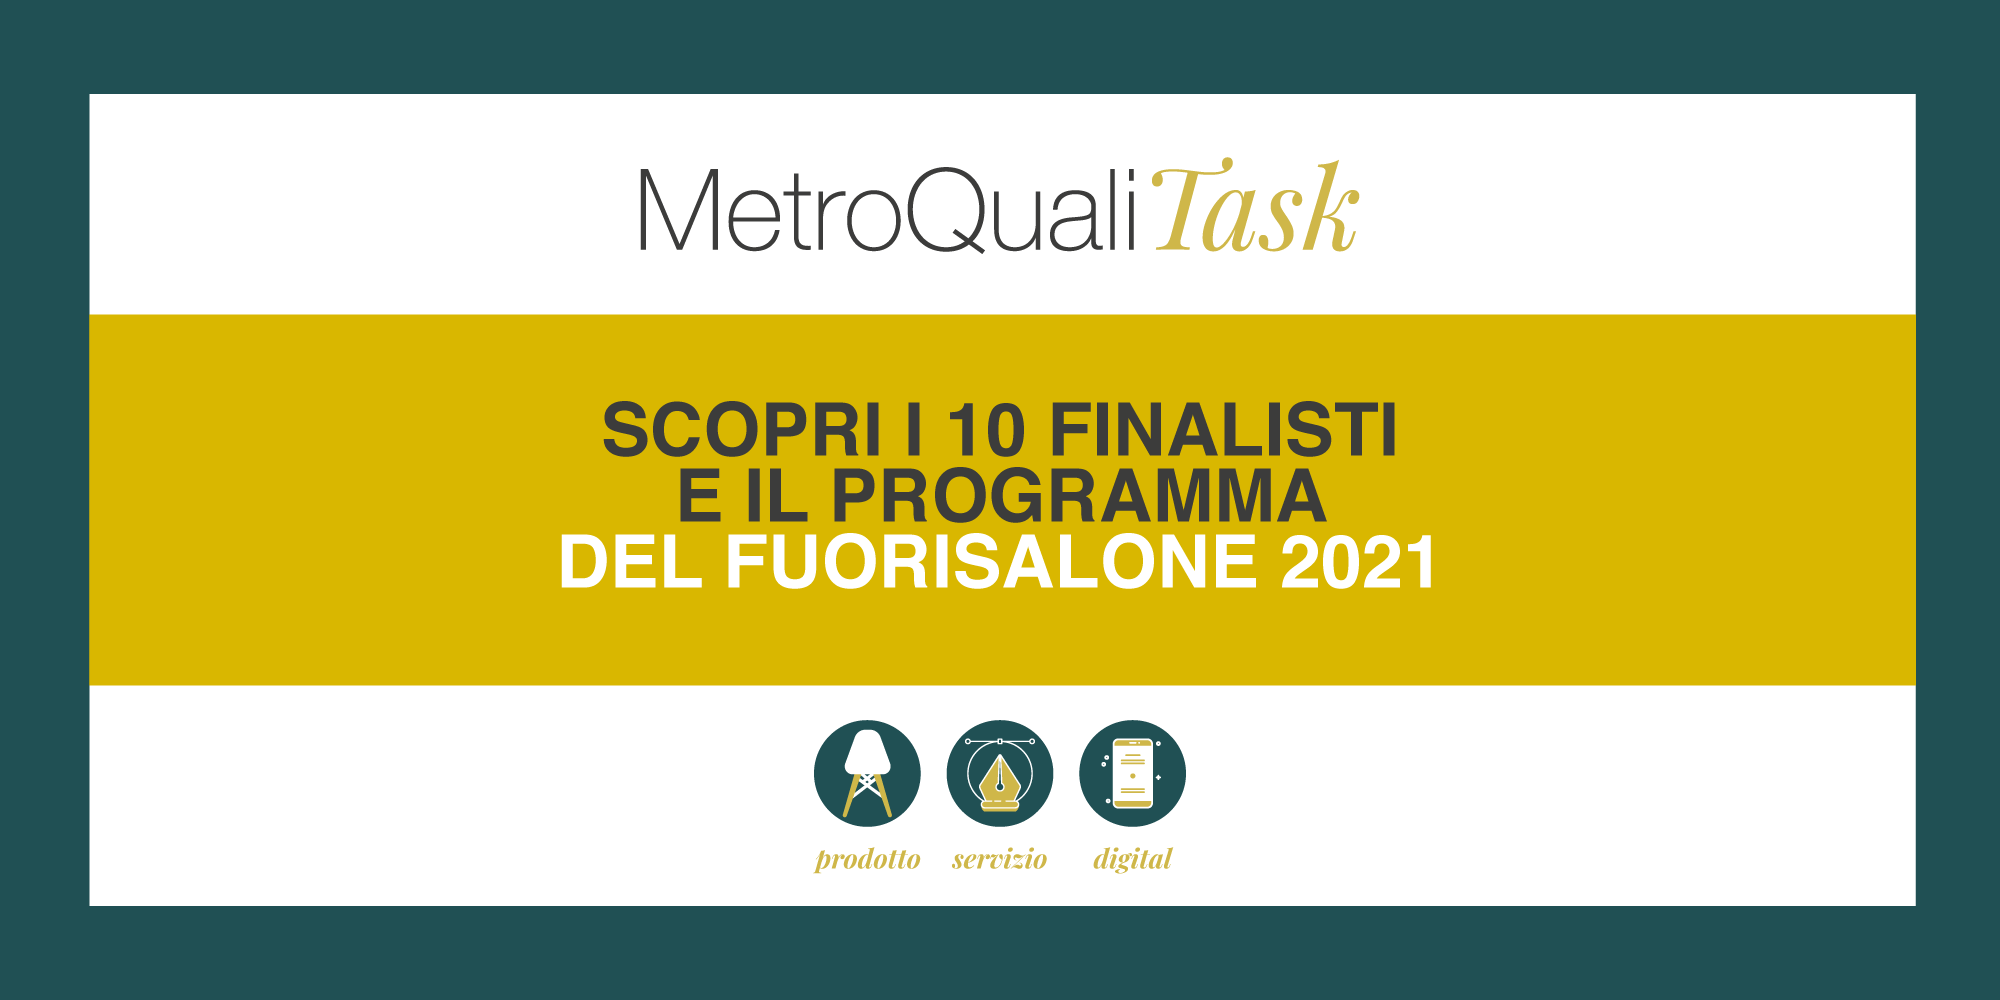 metroqualitask metroquality scopri i 10 finalisti contest